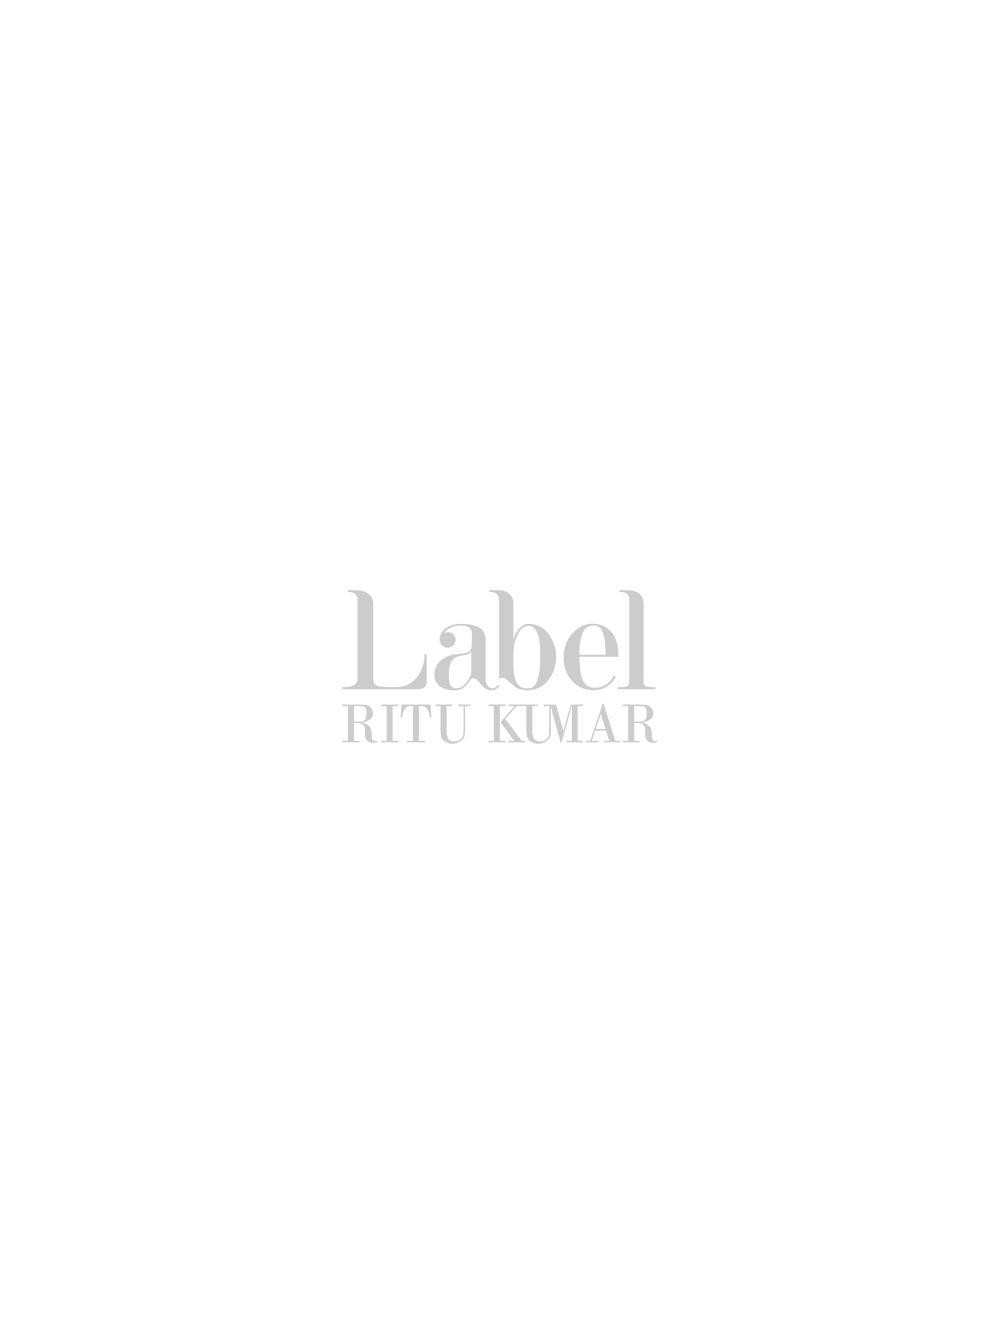 Scarf Print Top by Label Ritu Kumar